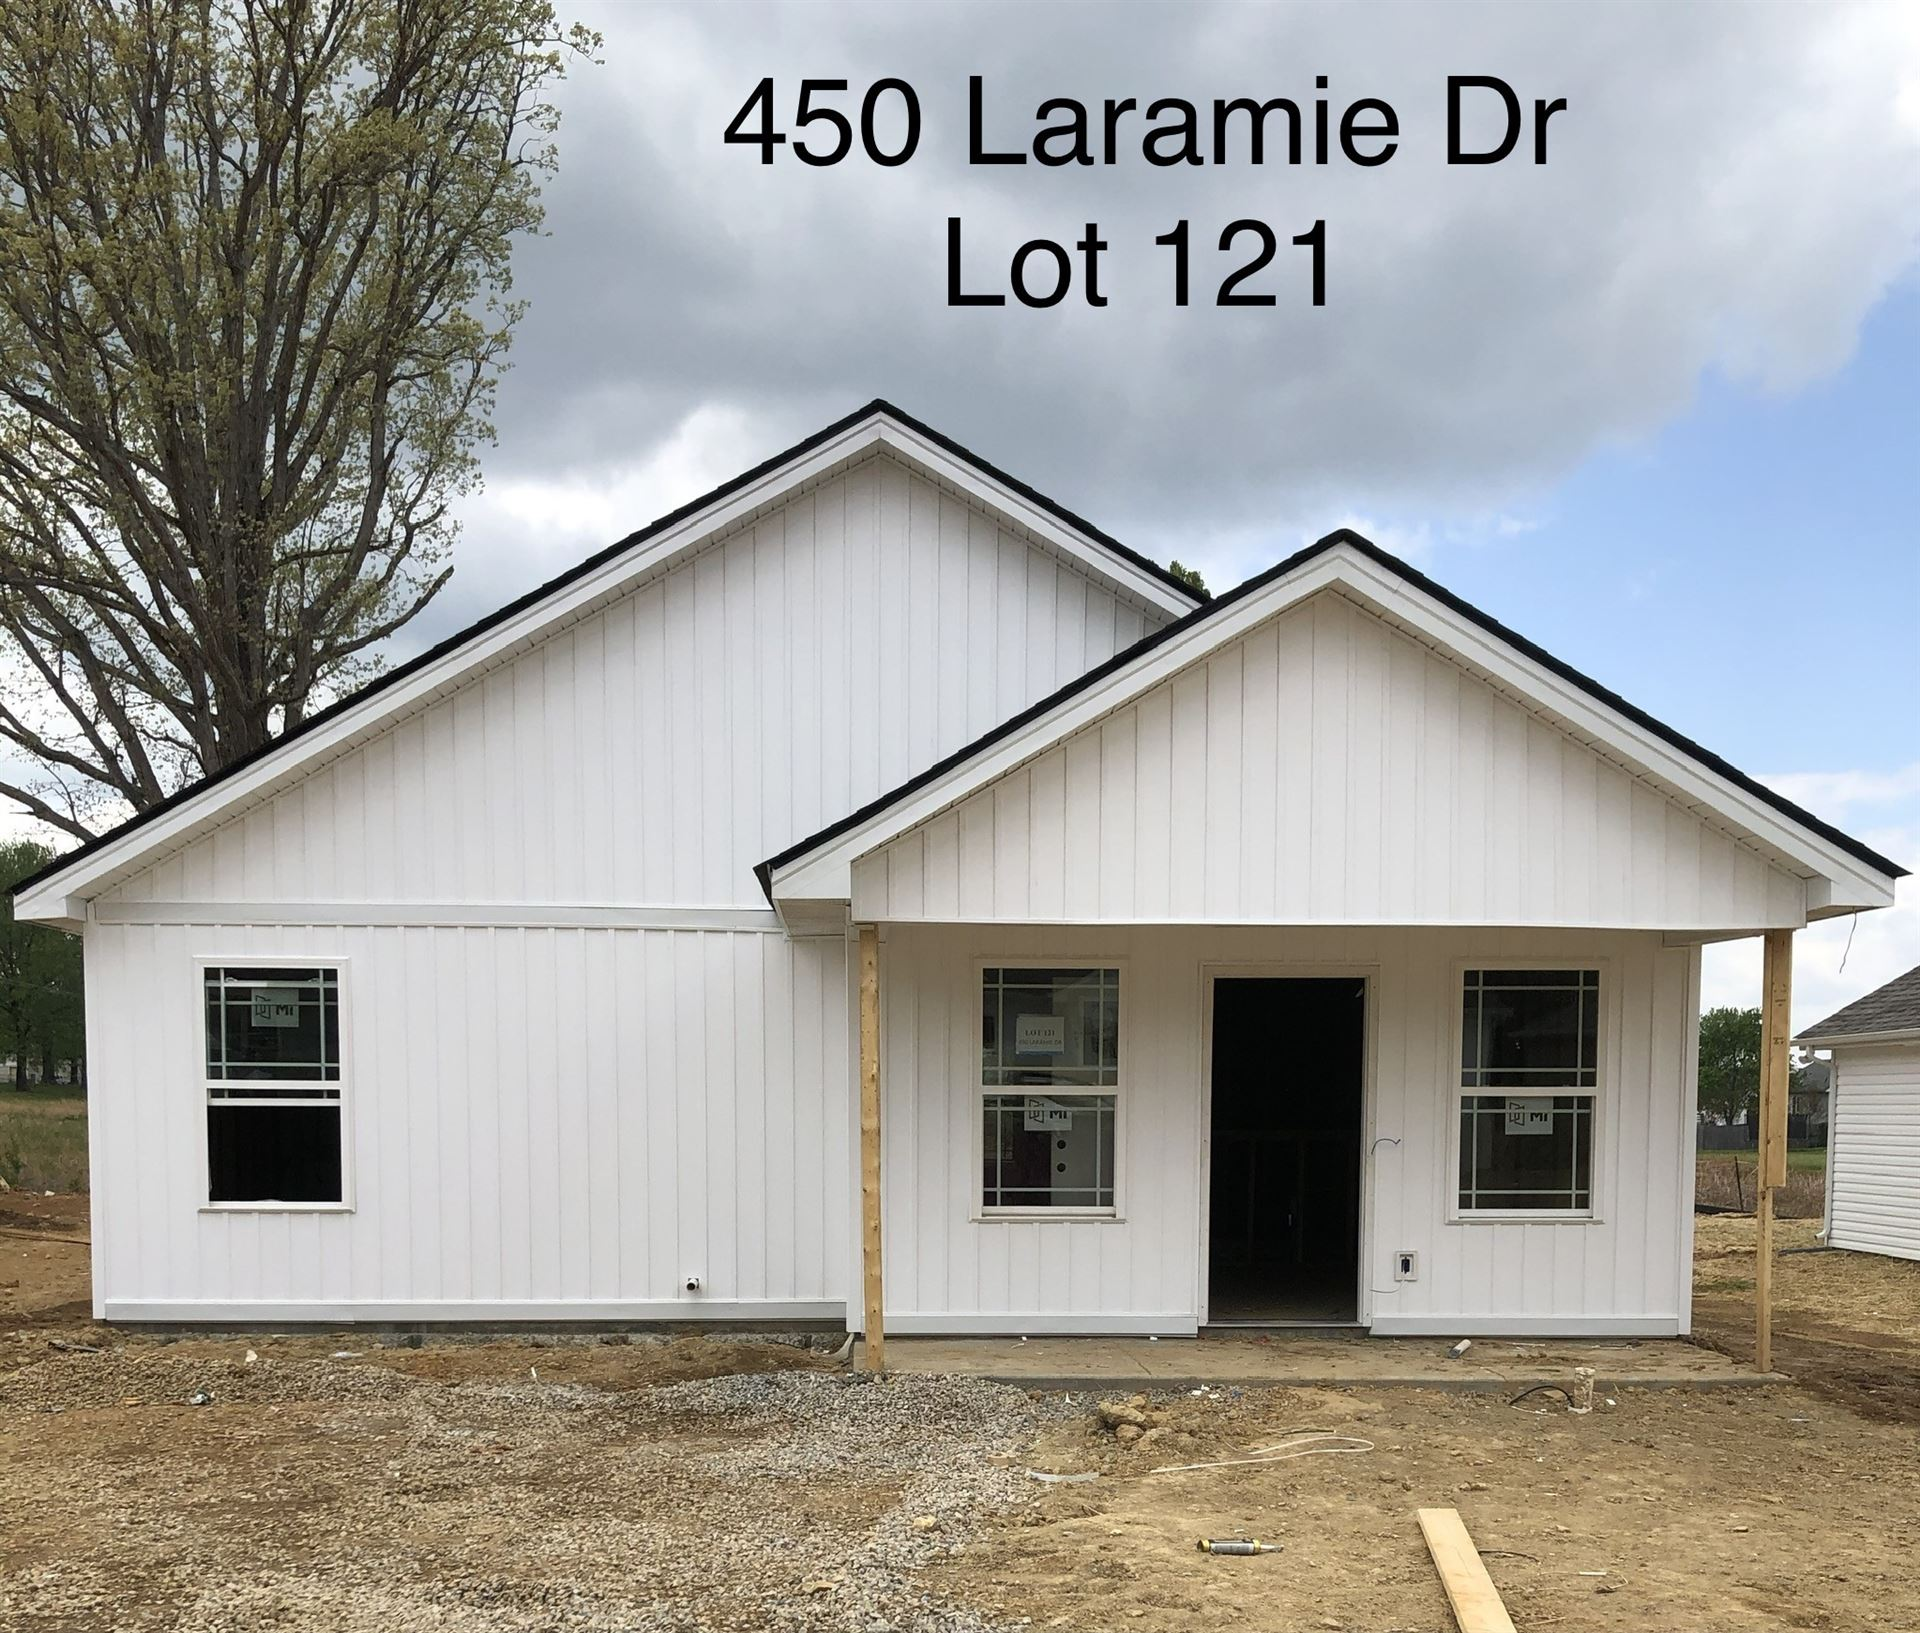 Photo of 450 Laramie Dr, Springfield, TN 37172 (MLS # 2246734)